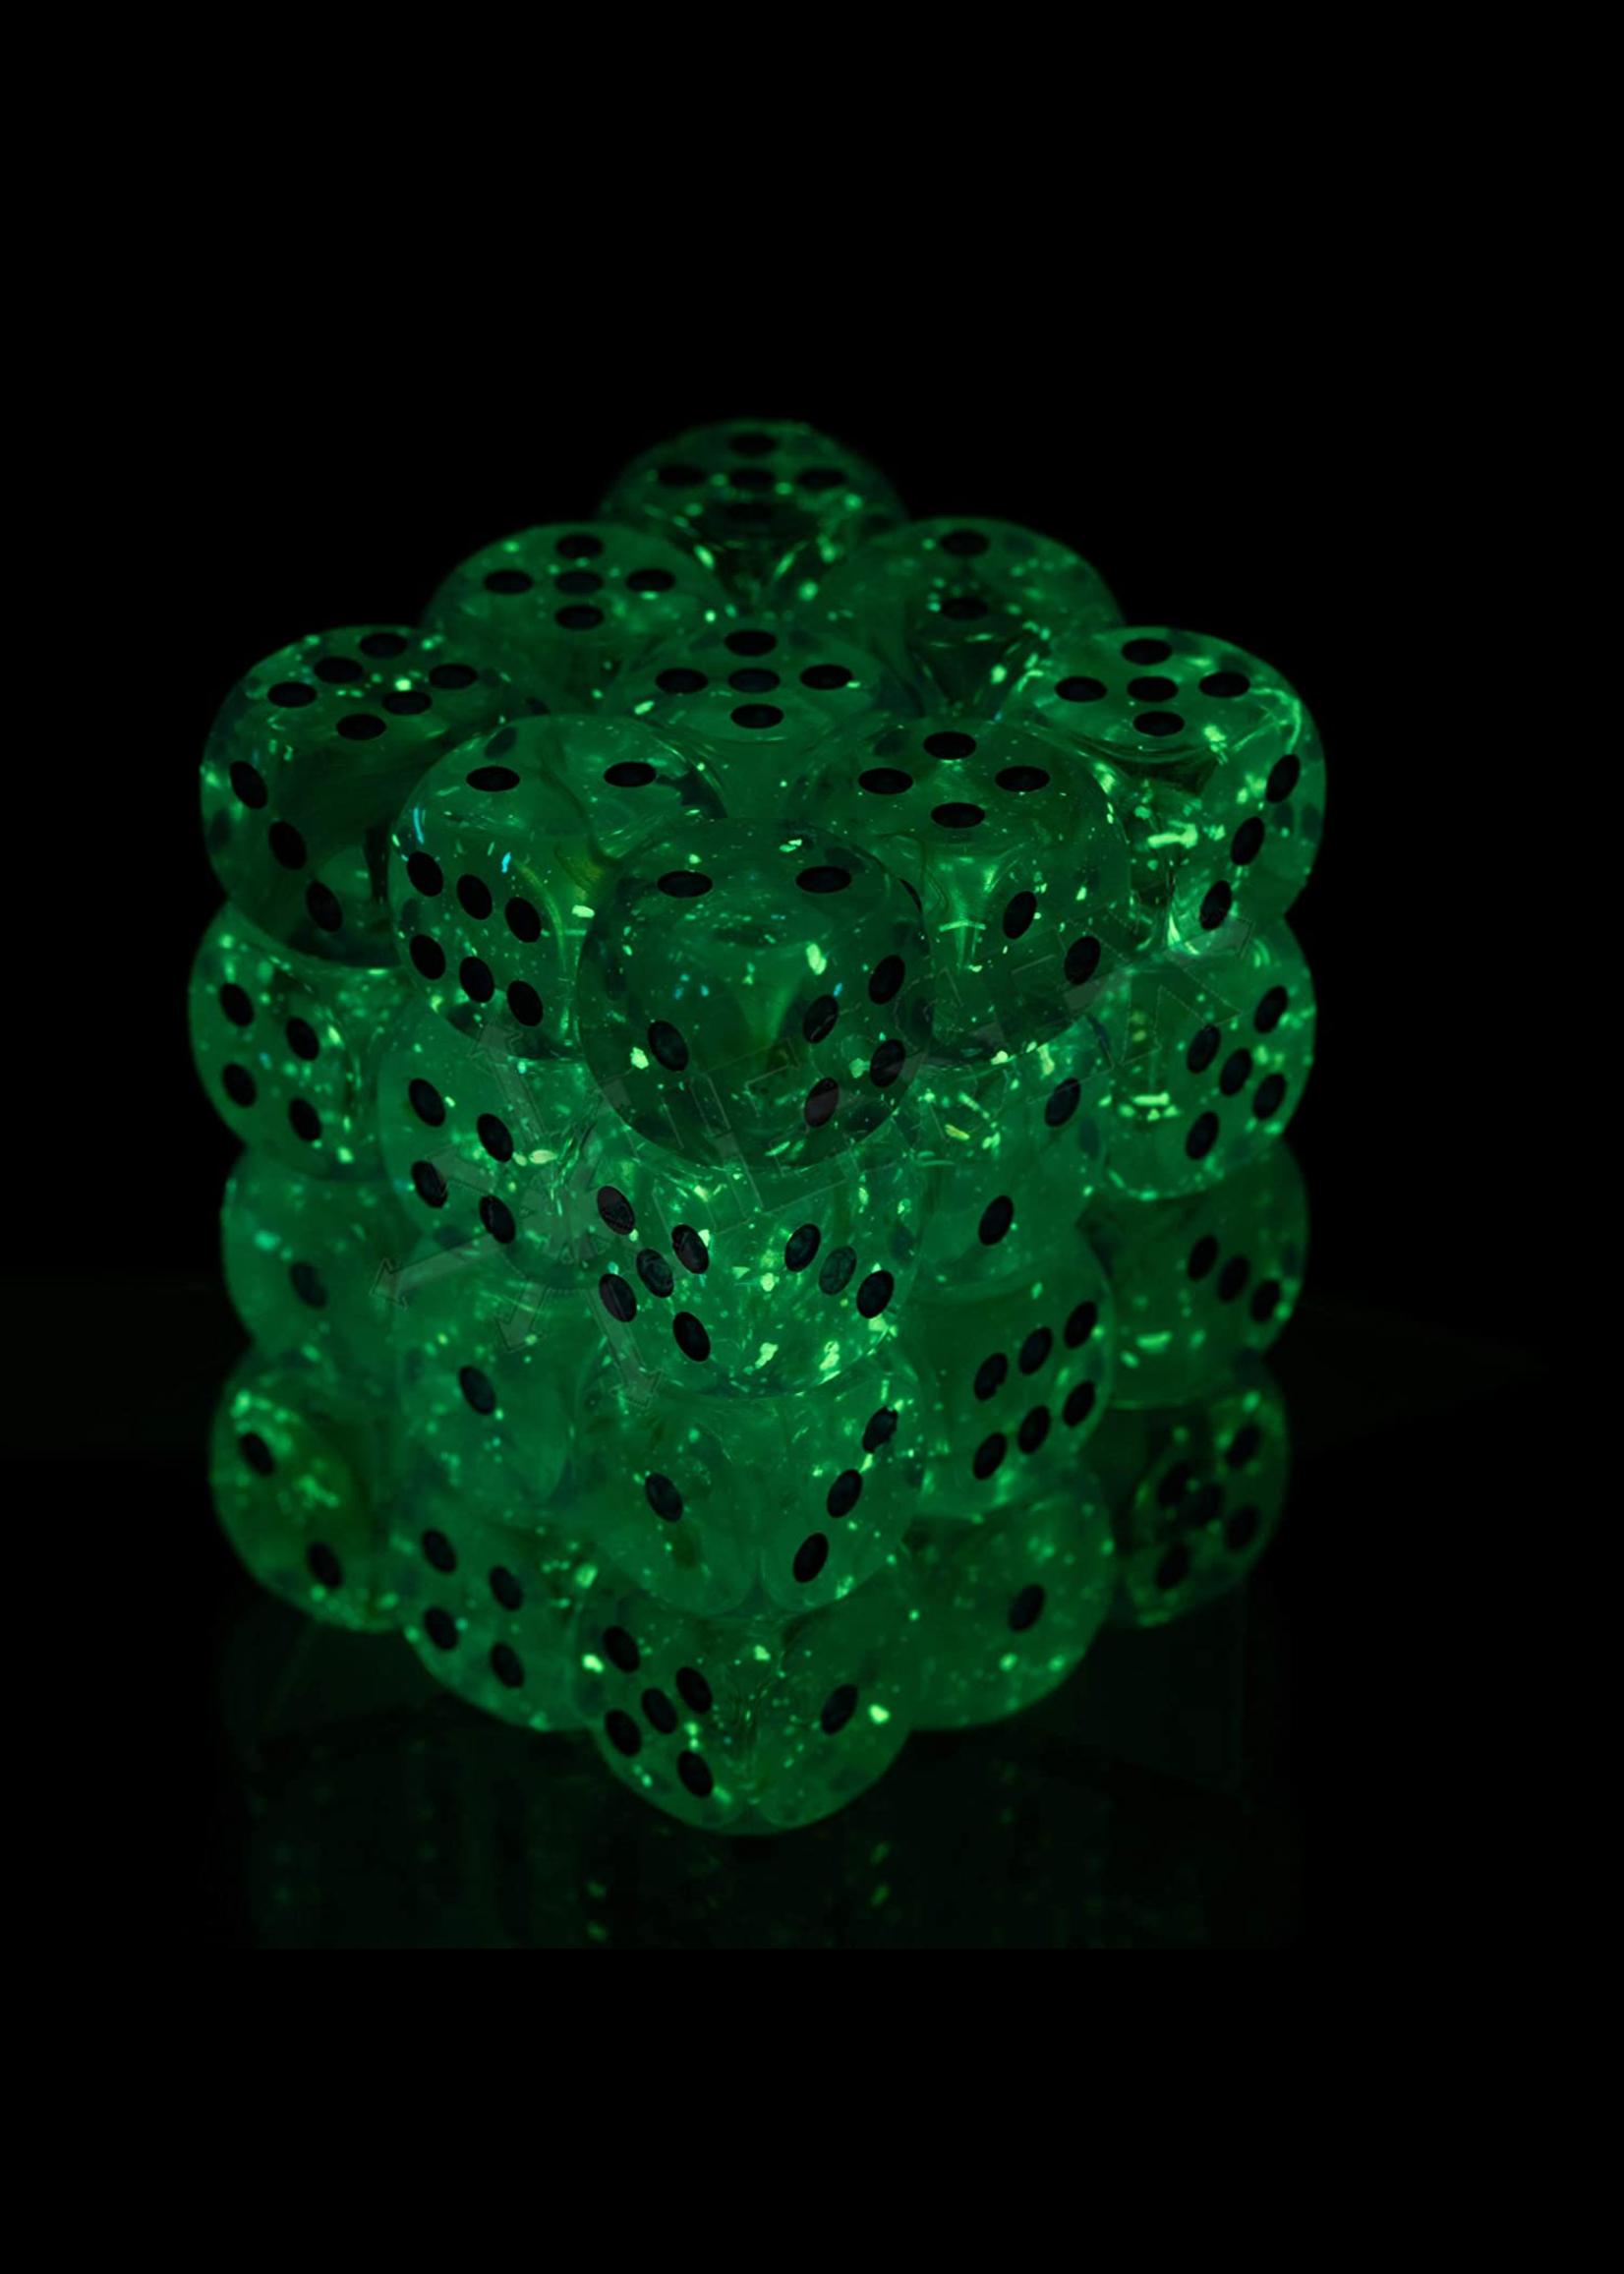 Chessex Borealis 12mm d6 Pink/silver Luminary Dice Block (36 dice)